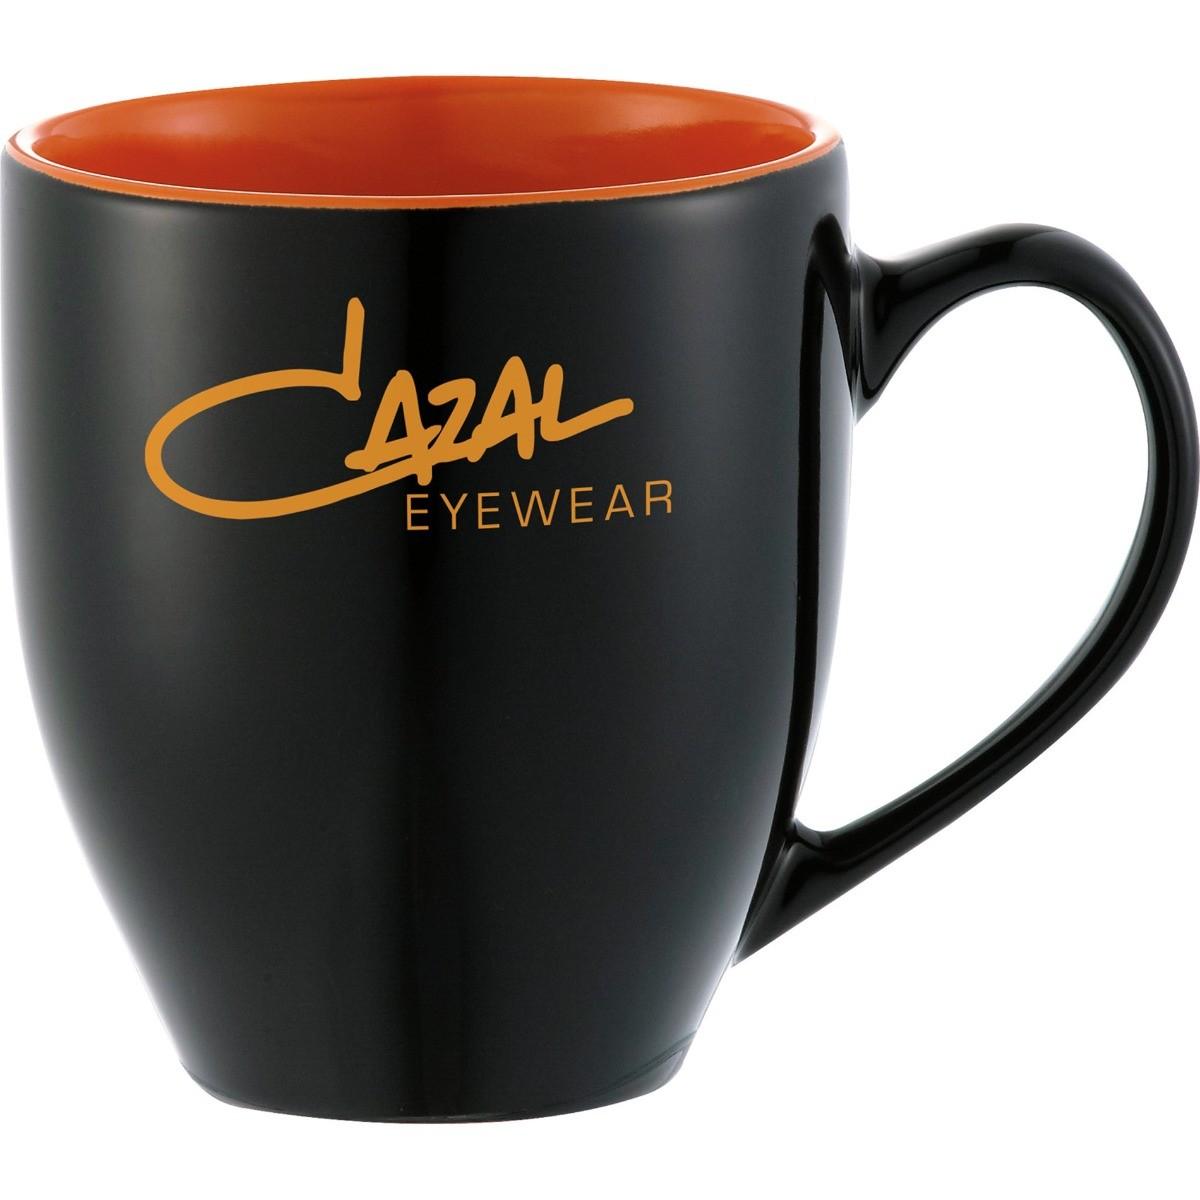 Zapata 15oz Mug Electric